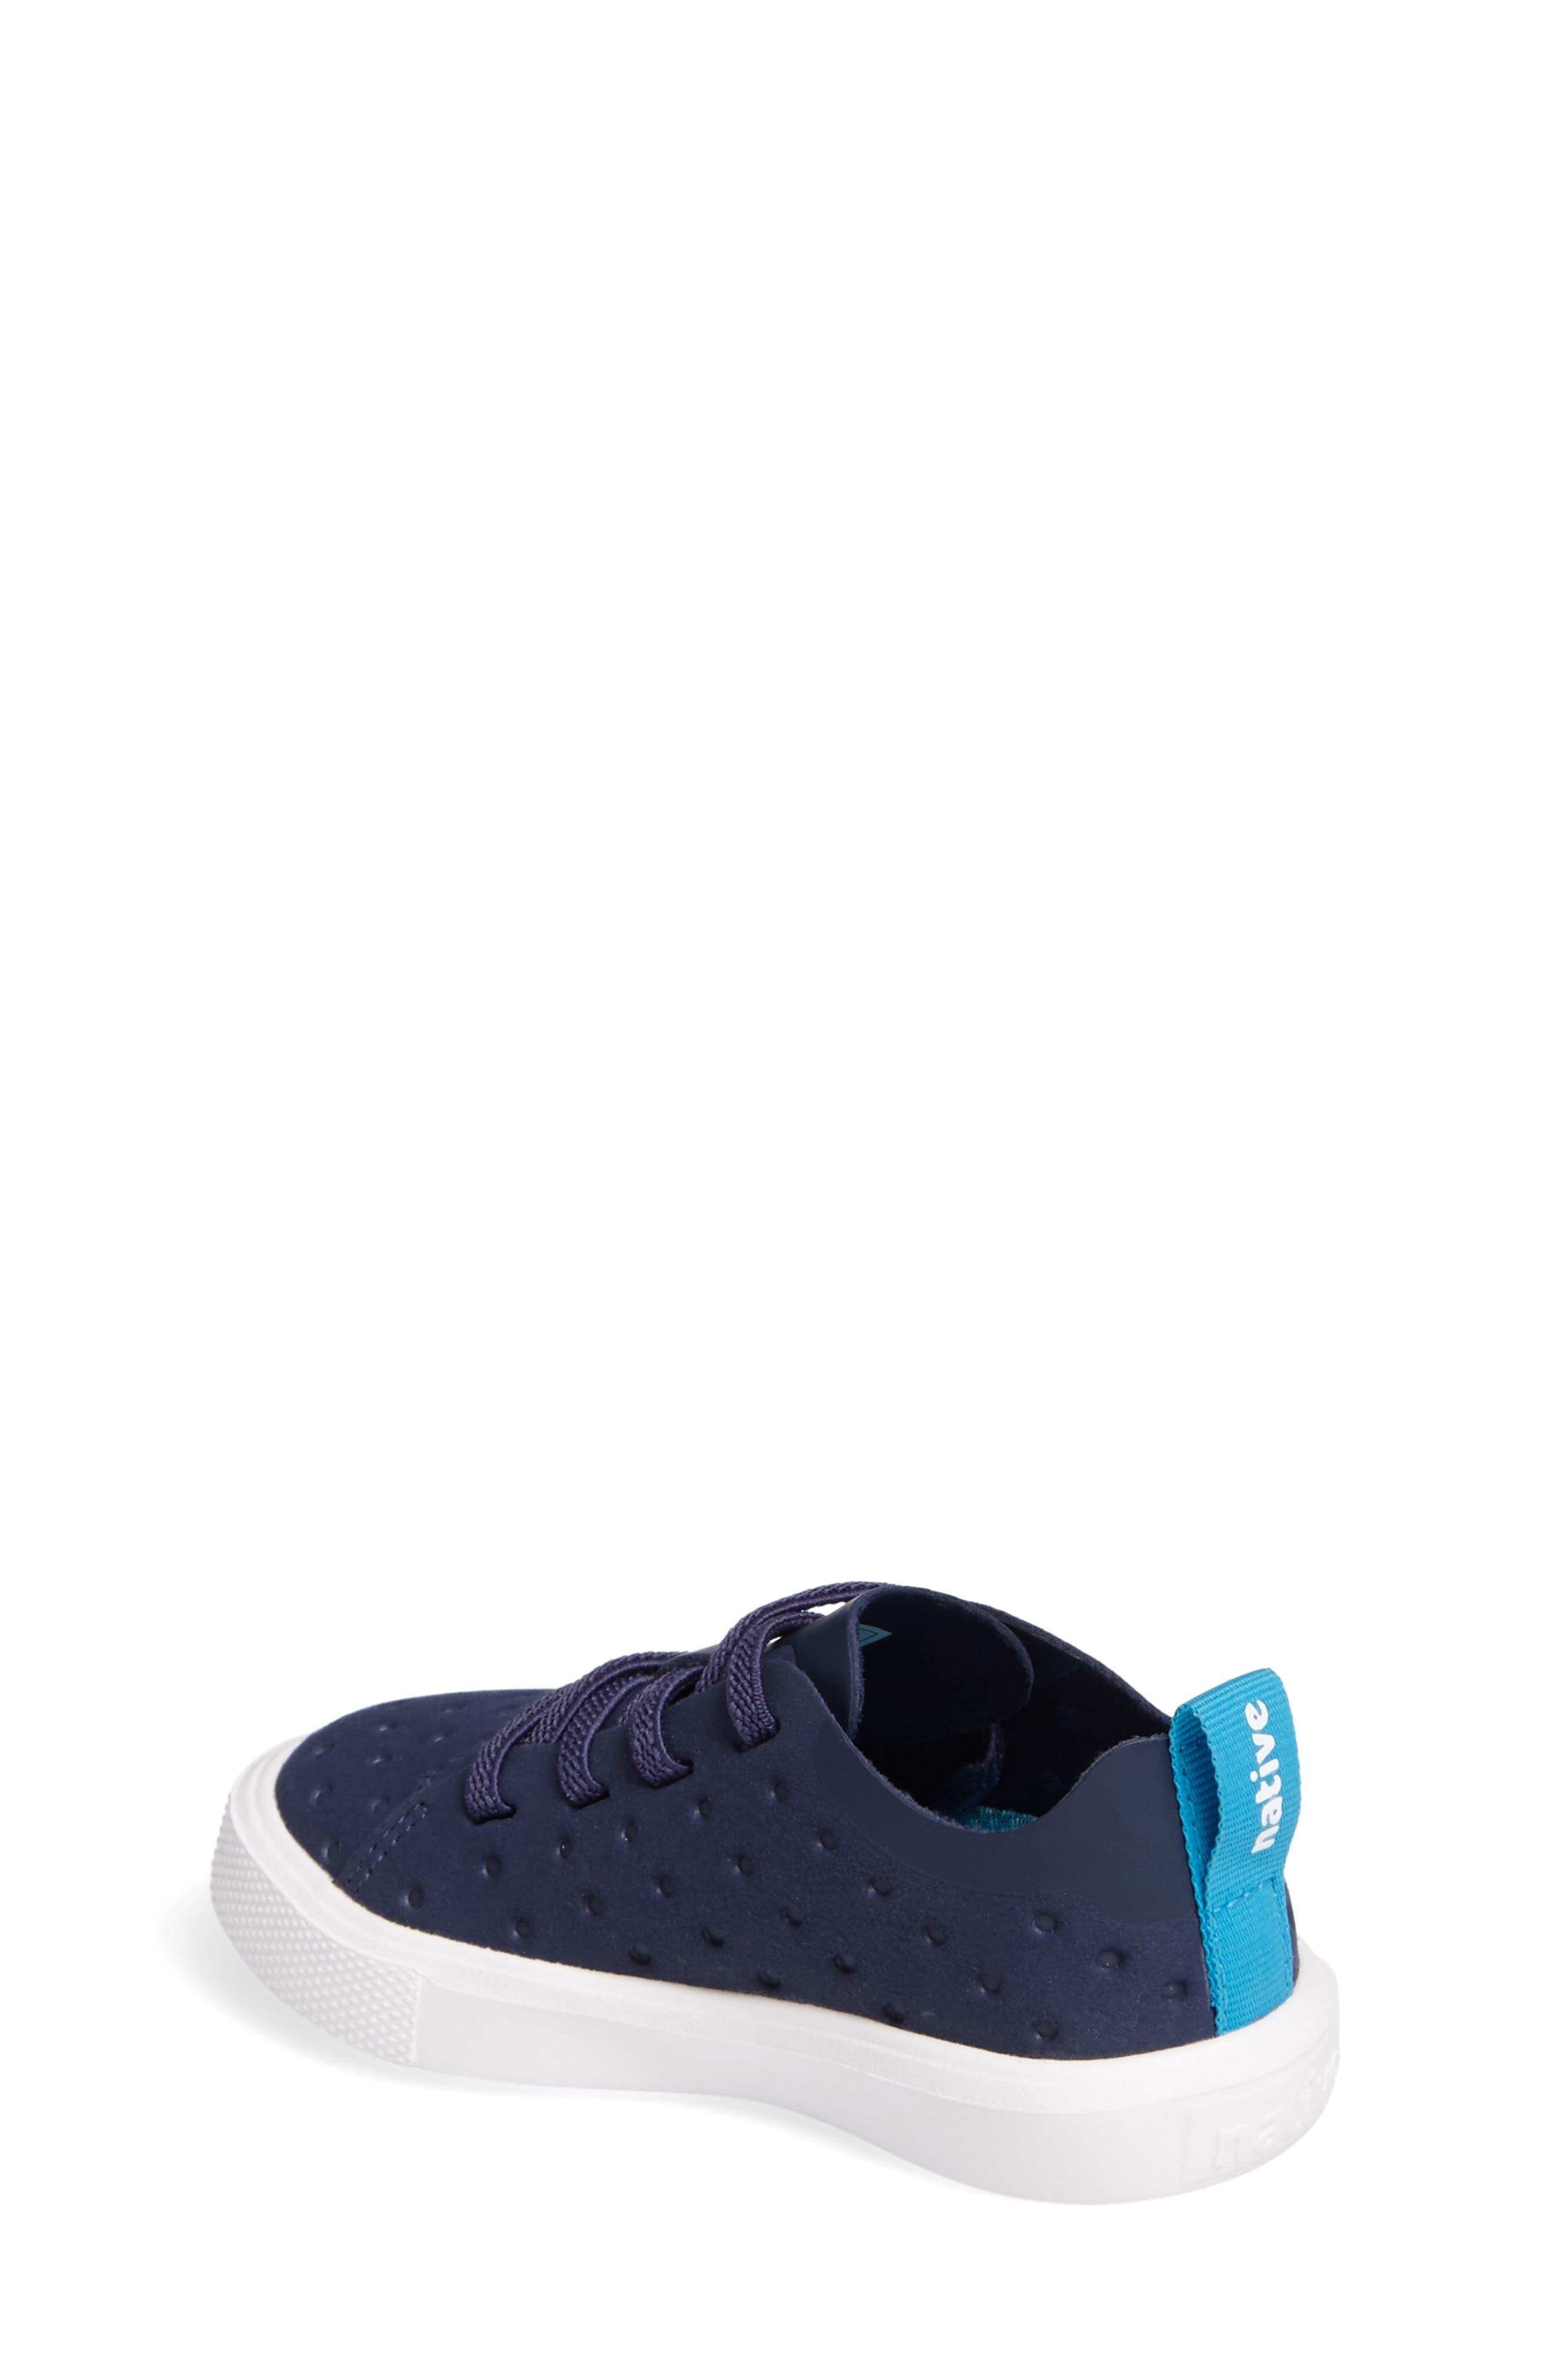 Alternate Image 2  - Native Shoes Monaco Water Repellent Sneaker (Walker, Toddler & Little Kid)